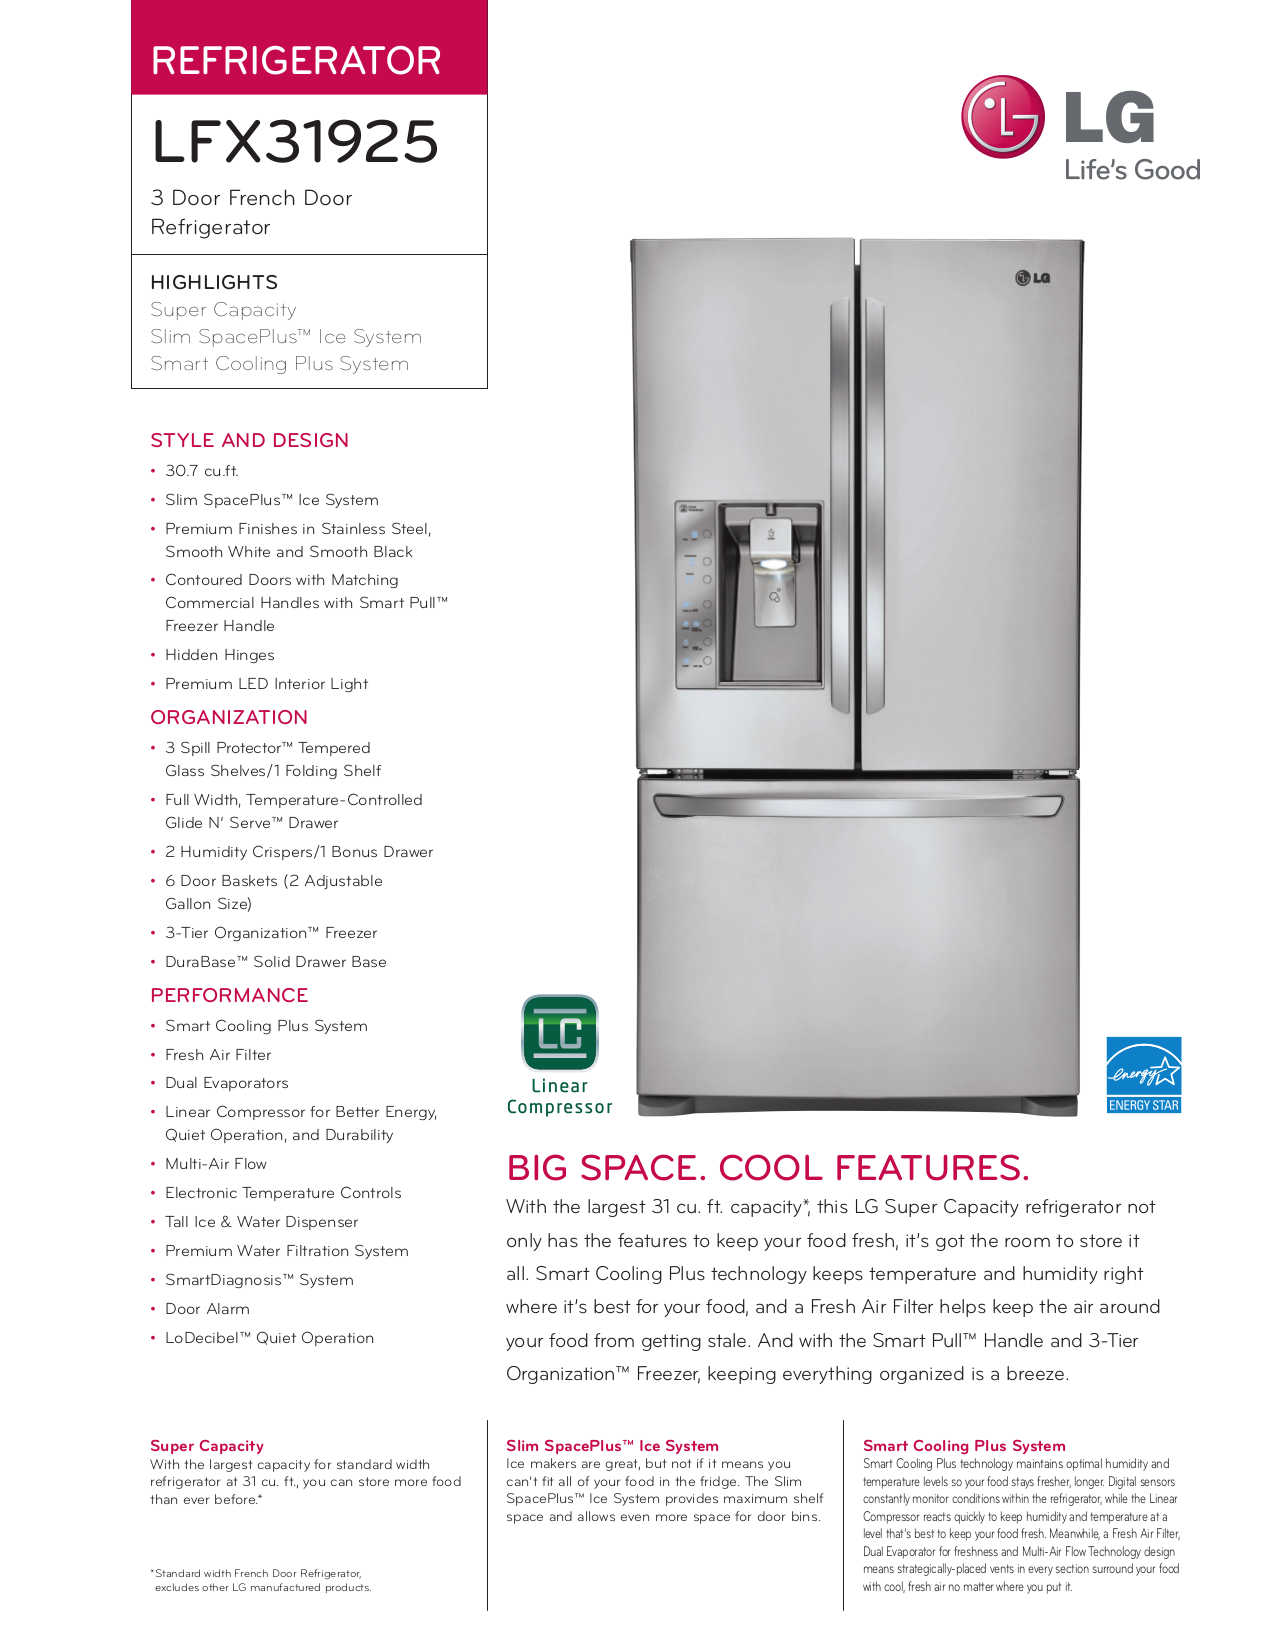 lg appliance manual various owner manual guide u2022 rh justk co lg refrigerator user manual pdf lg refrigerator service manual pdf